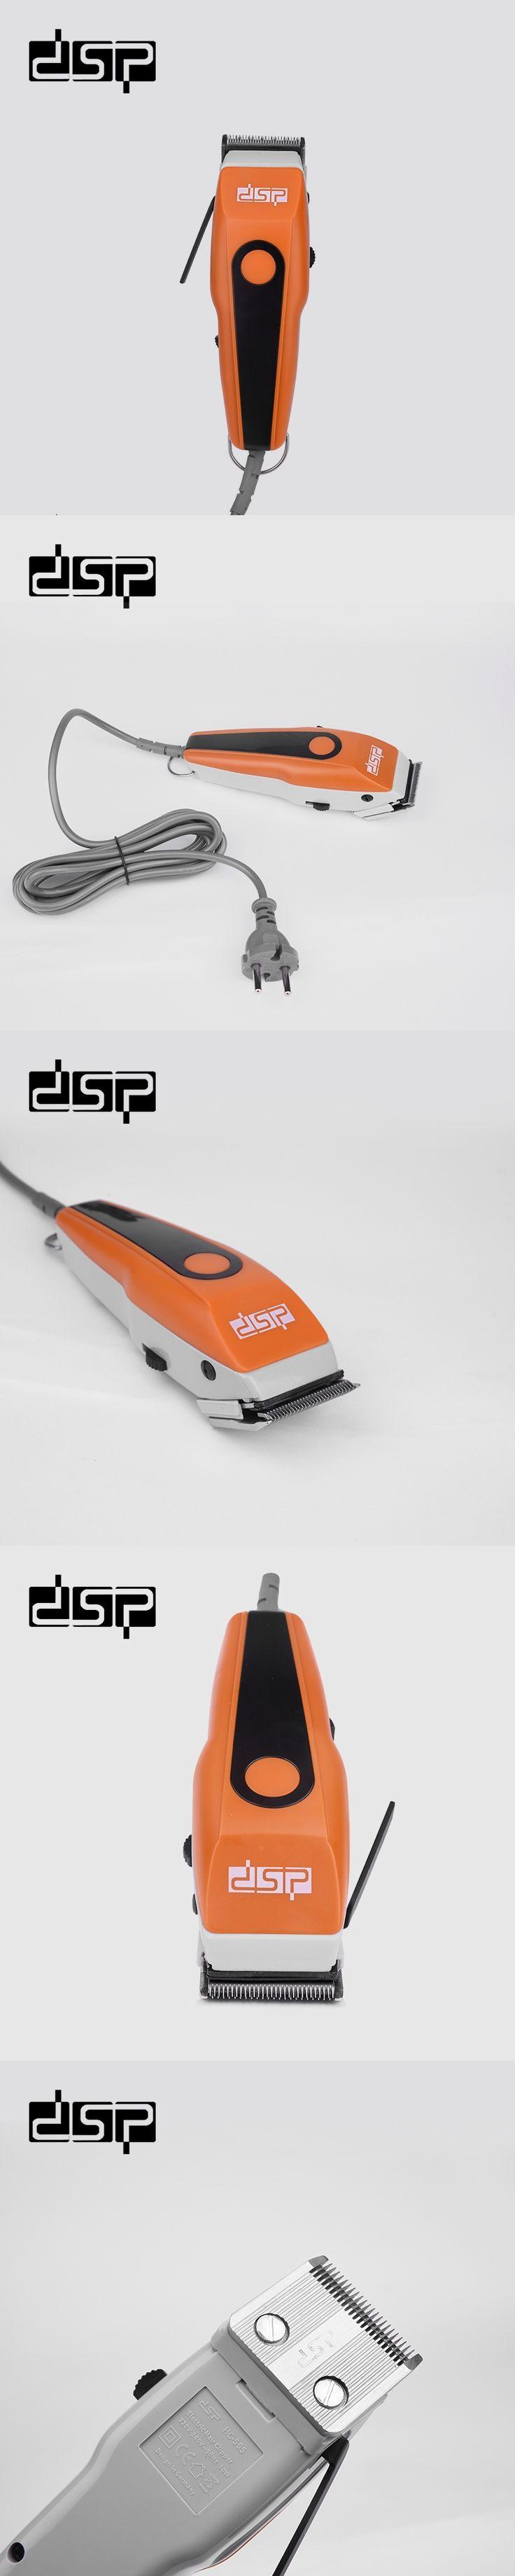 DSP Professional Hair Clipper Electric Hair Trimmer Beard Clippers Hair Cutting Machine Barber Tools HC-555